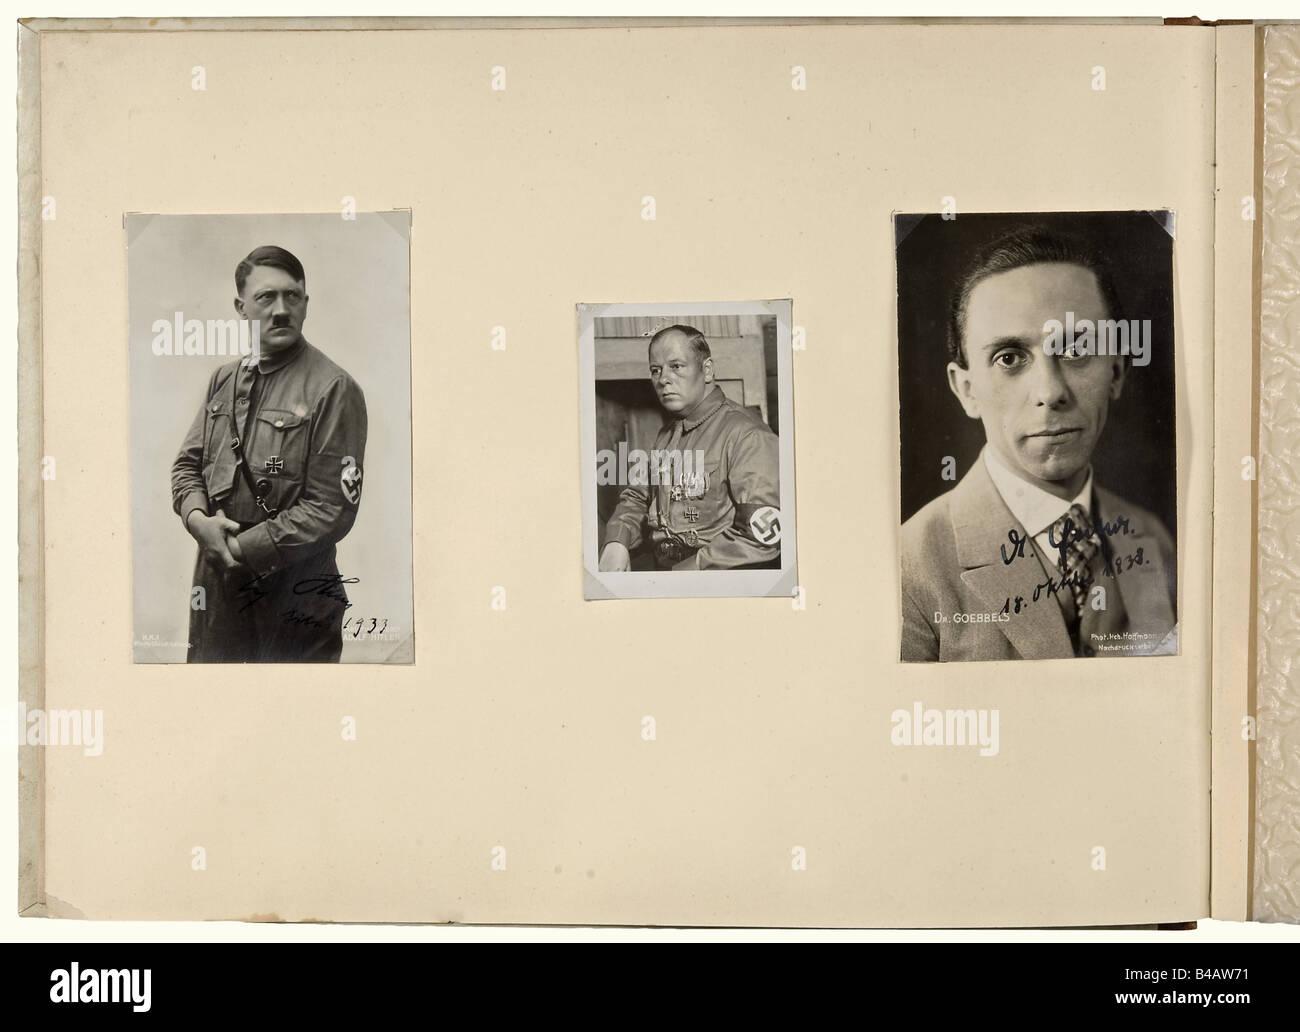 r i stock photos r i stock images alamy sa sturmbannfuumlhrer berthold sutter a photo album 1933 1938 of the leaders